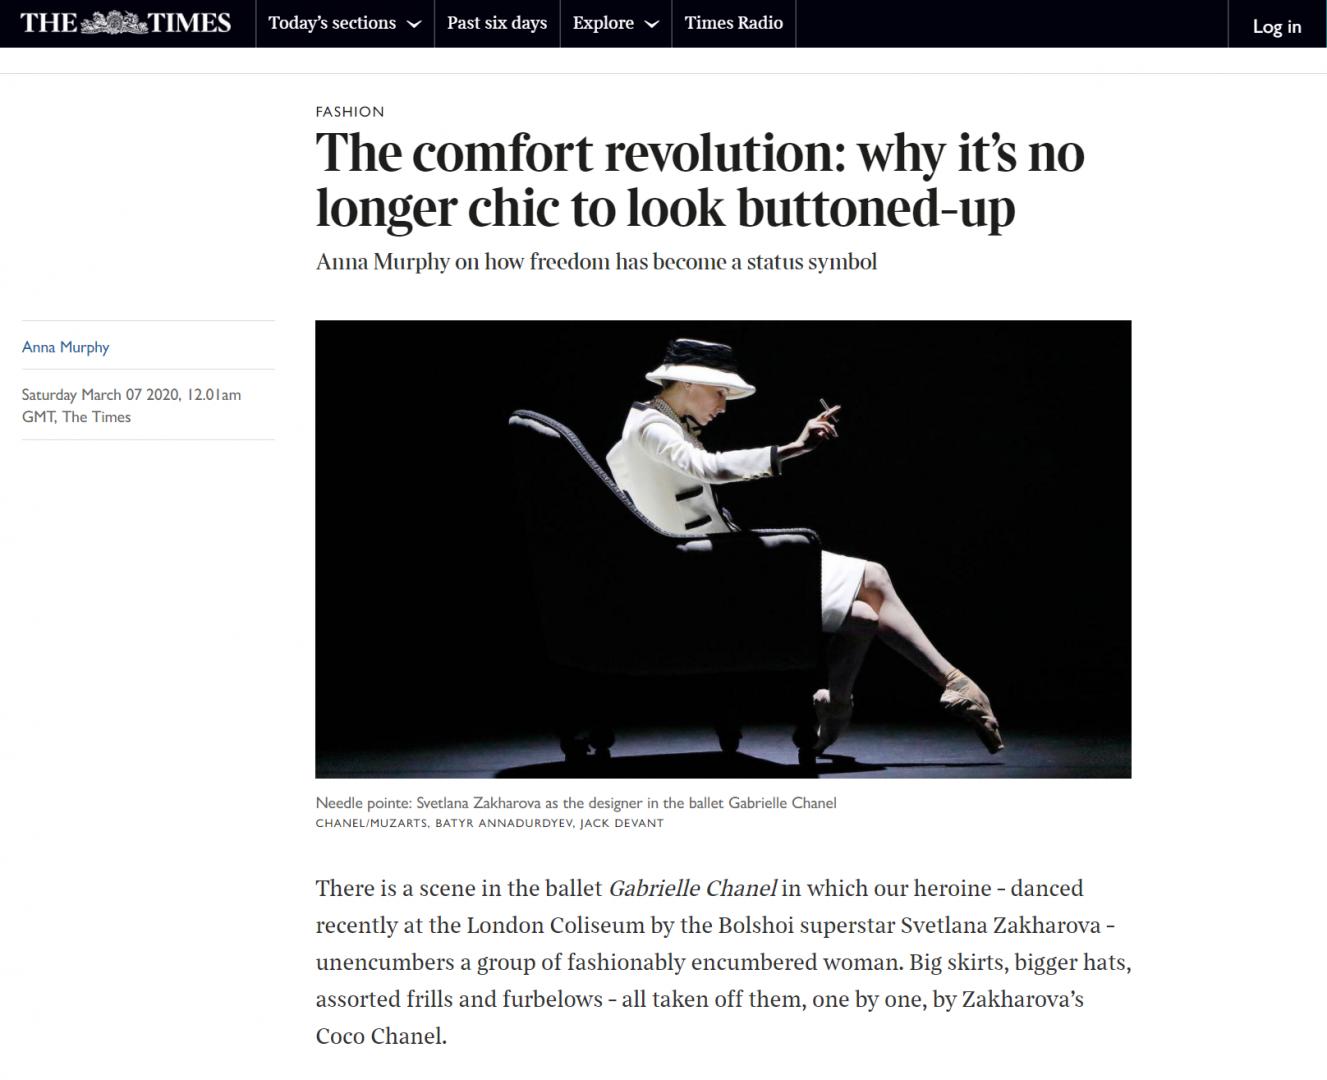 Gabrielle Chanel / Svetlana Zakharova photos for The Times